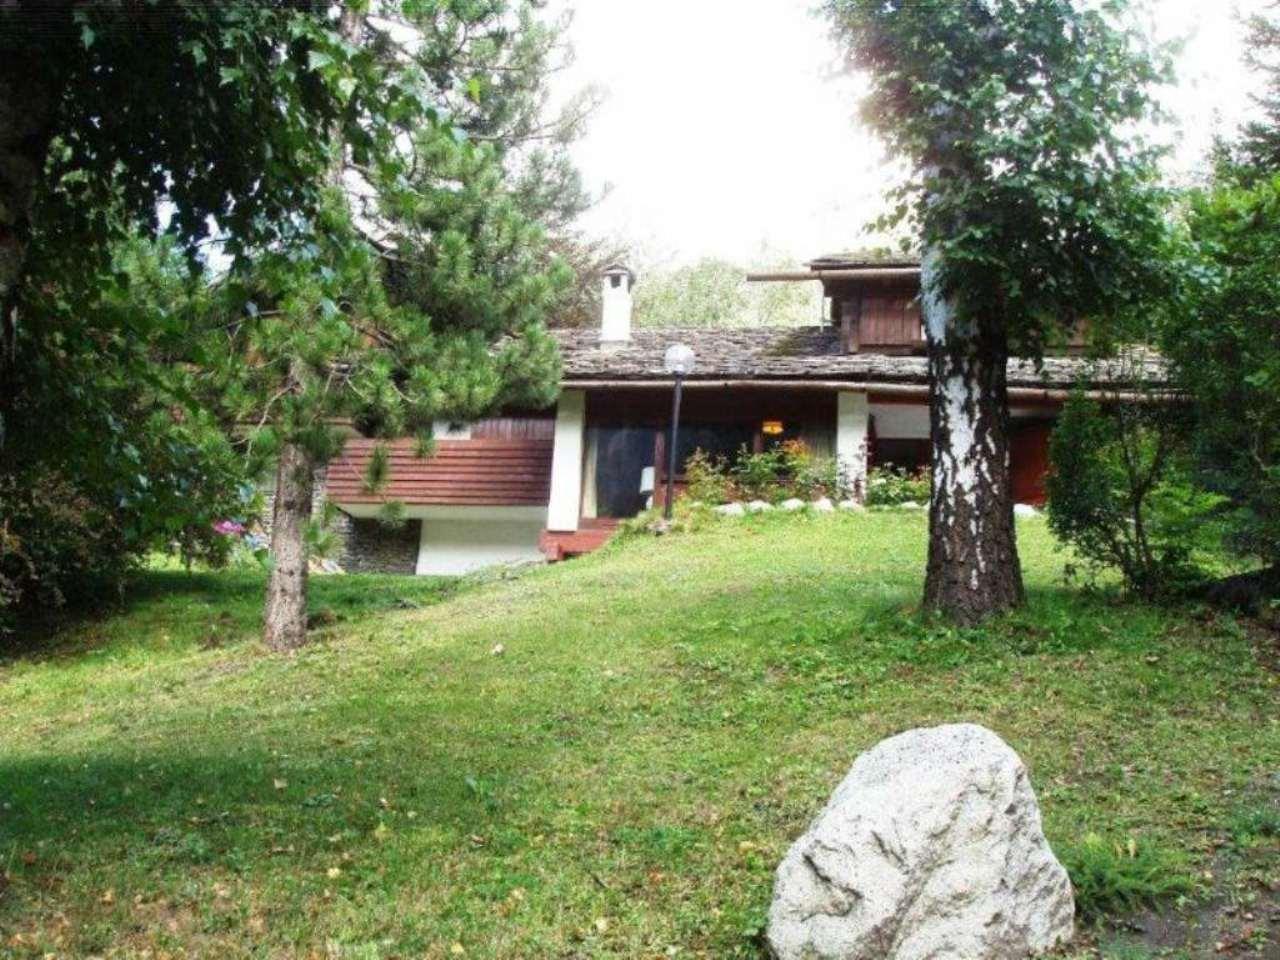 Villa in Vendita a Courmayeur: 5 locali, 450 mq